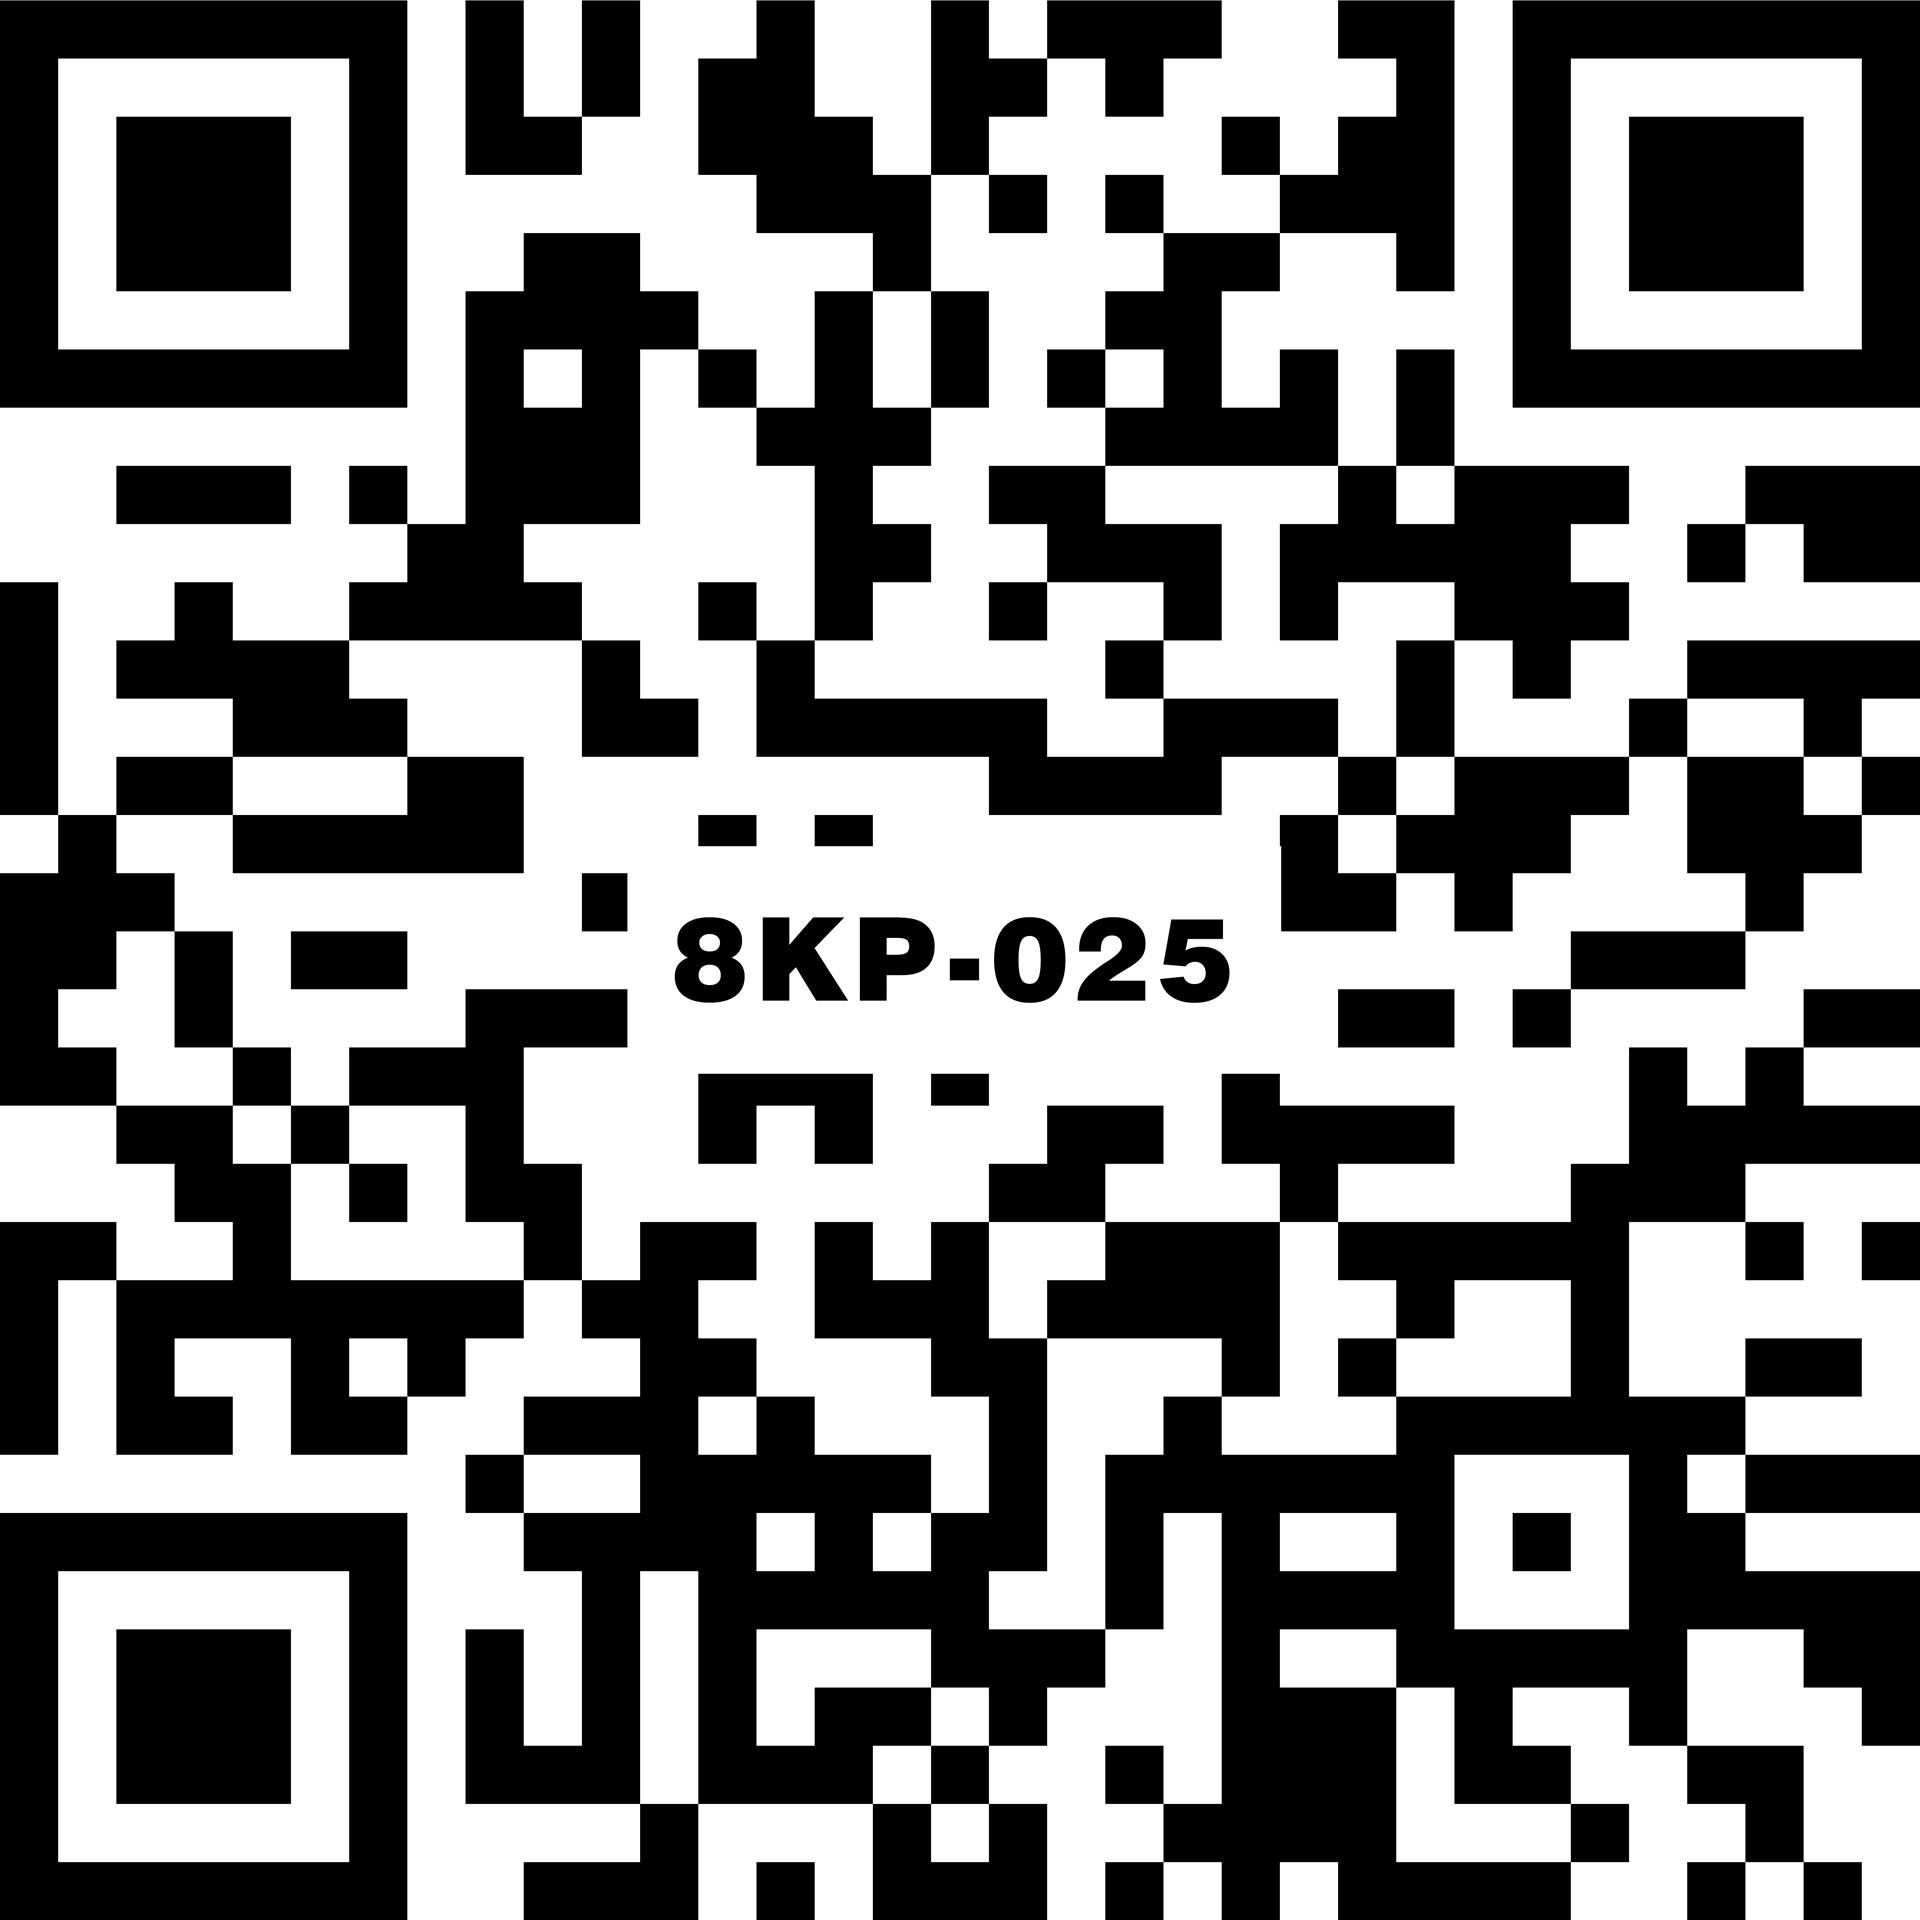 8KP-025